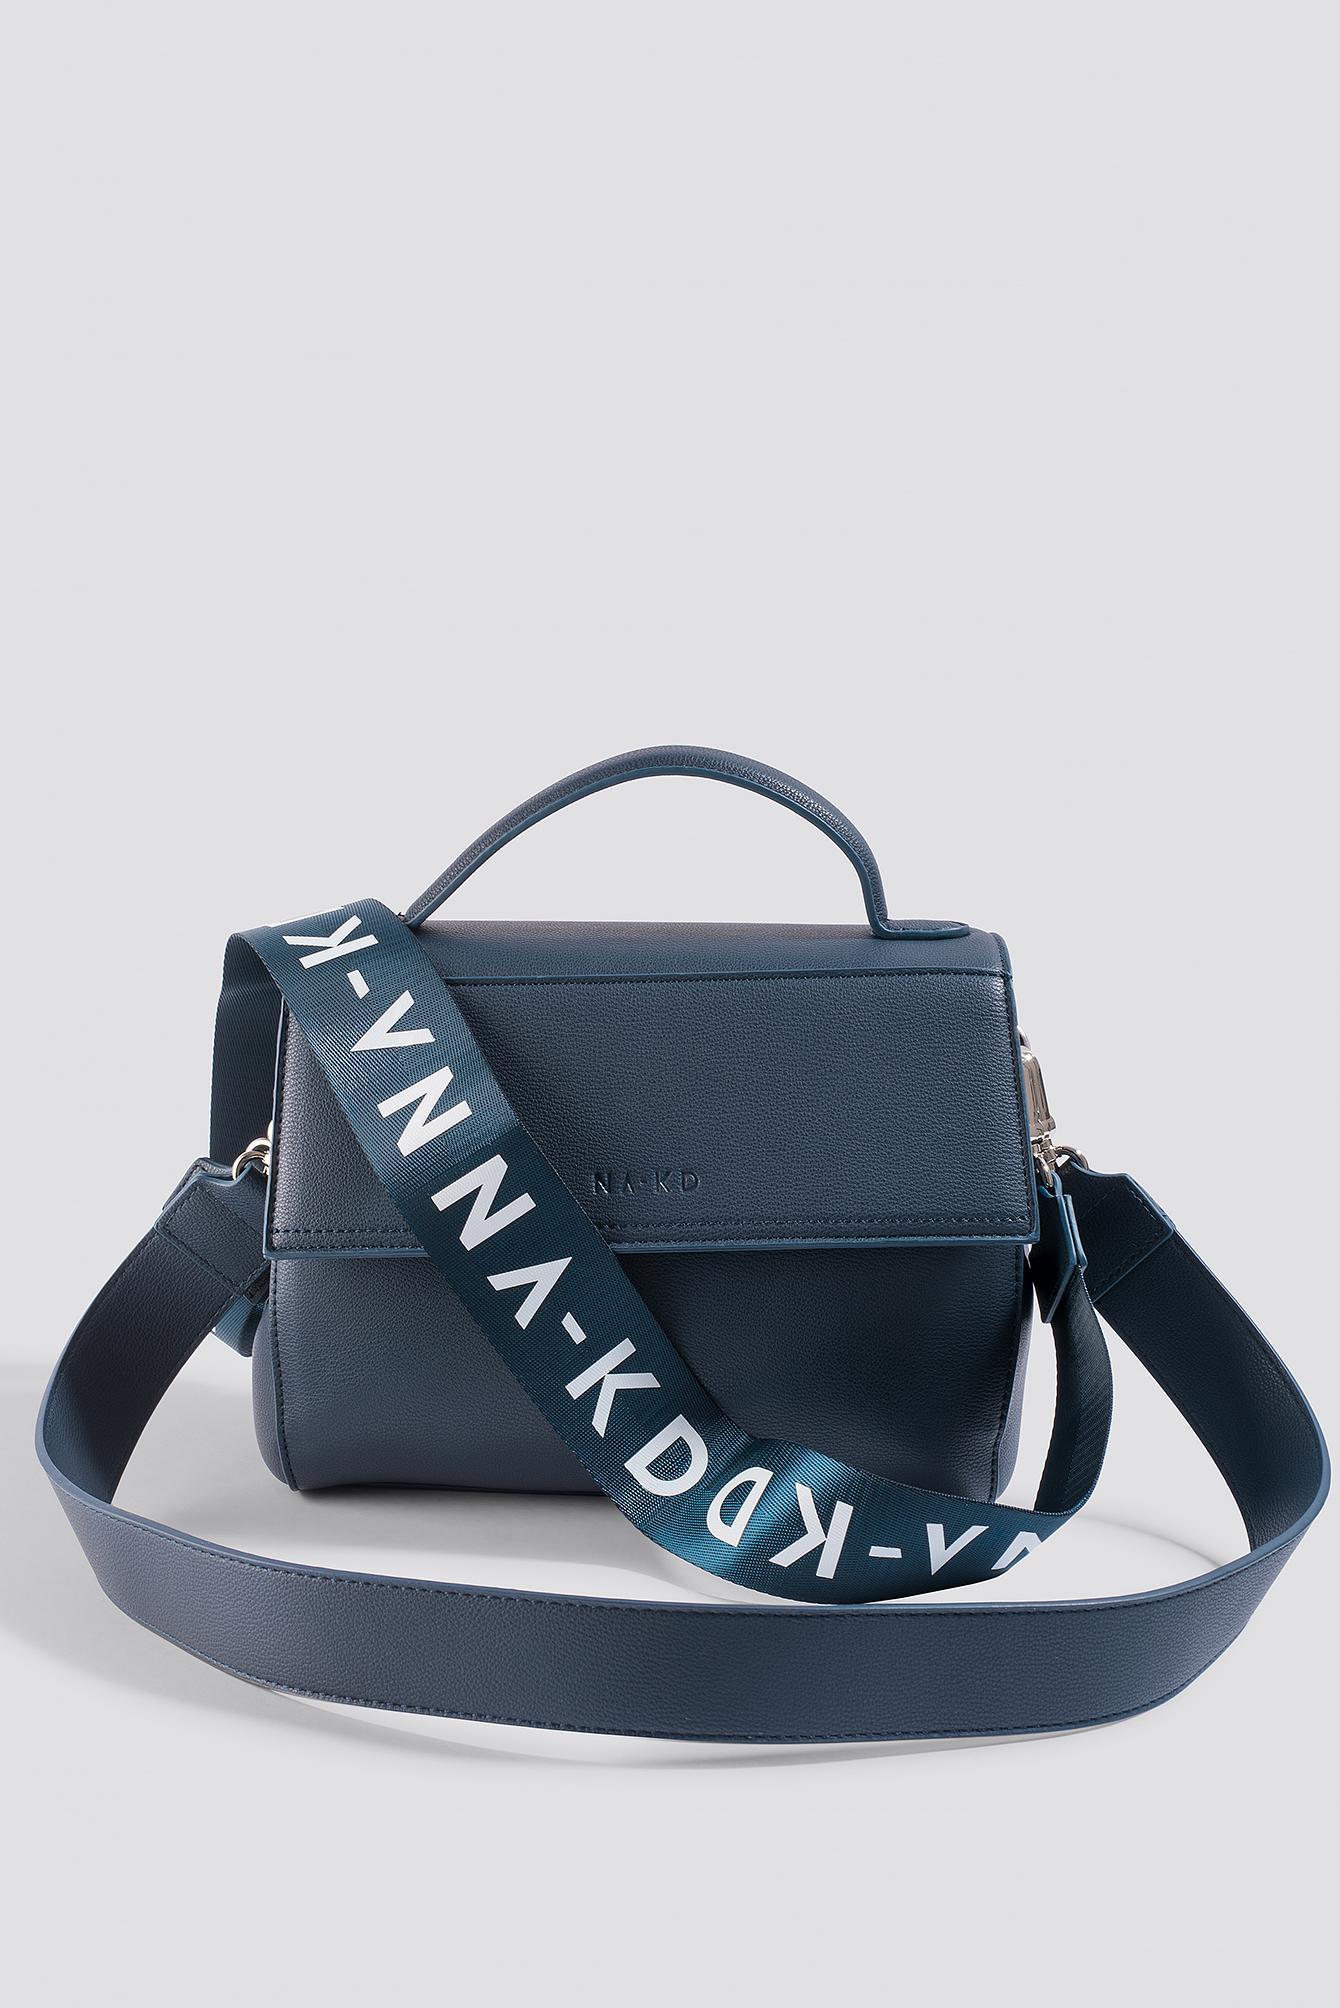 Lyst - NA-KD Handbag With Strap Navy in Blue 91f79cd11